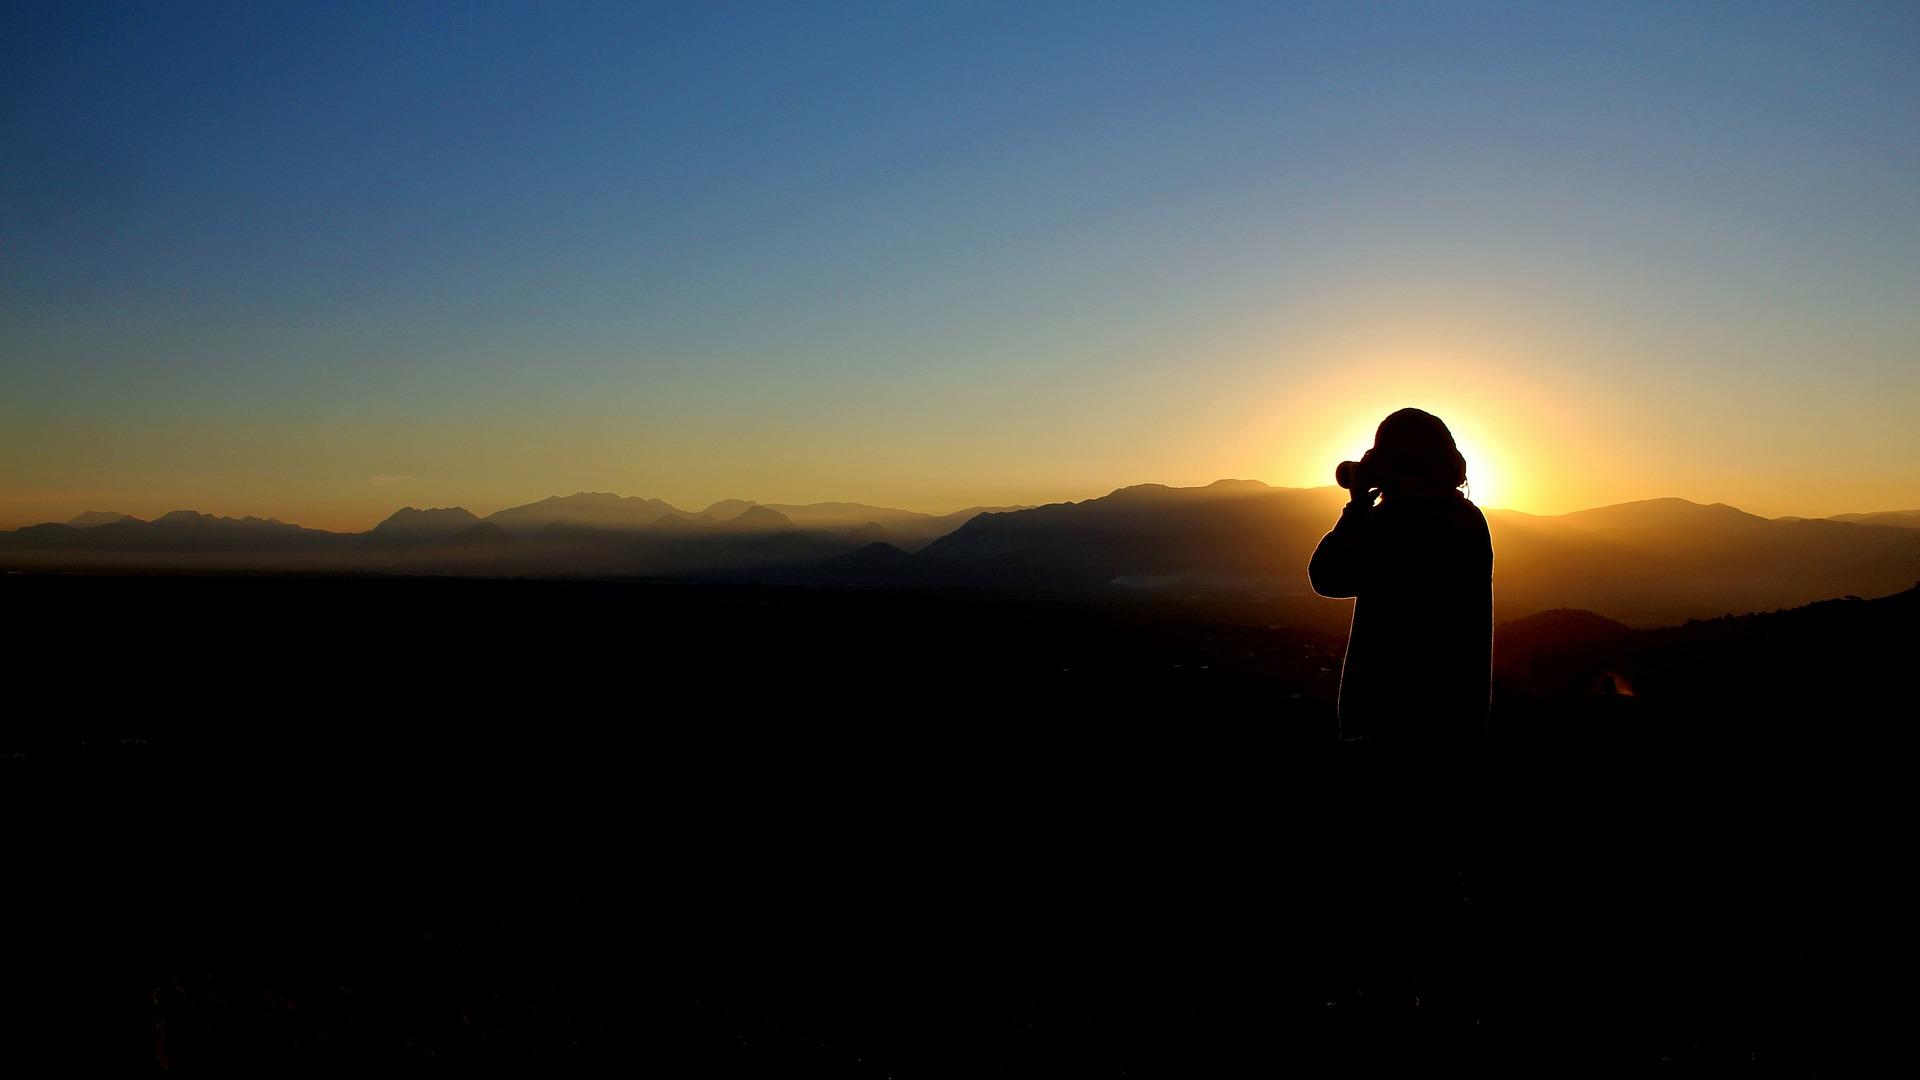 sunset_photographe_voyage_contact